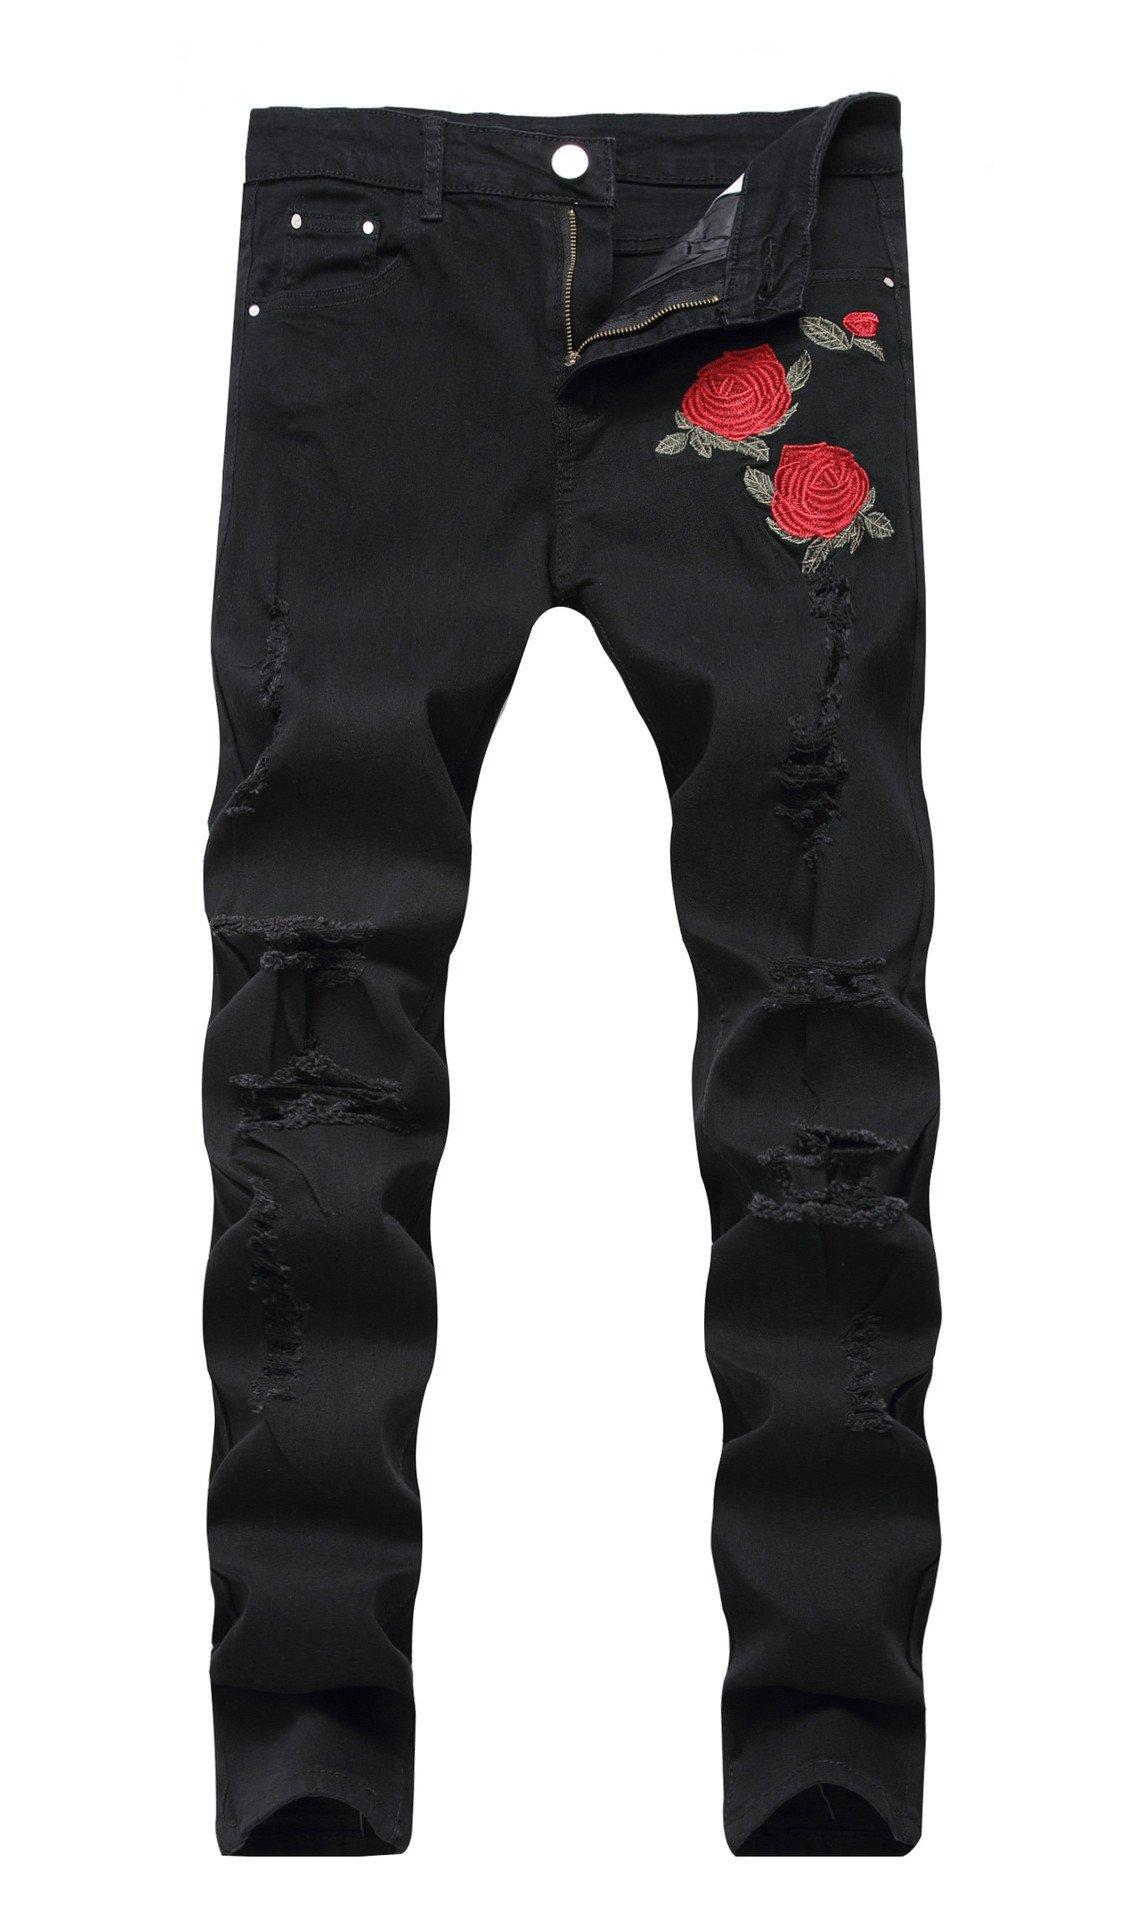 Vionr Men¡¯s Fashion Embroideried Flower Ripped Broken Hole Slim Fit Denim Jeans Black